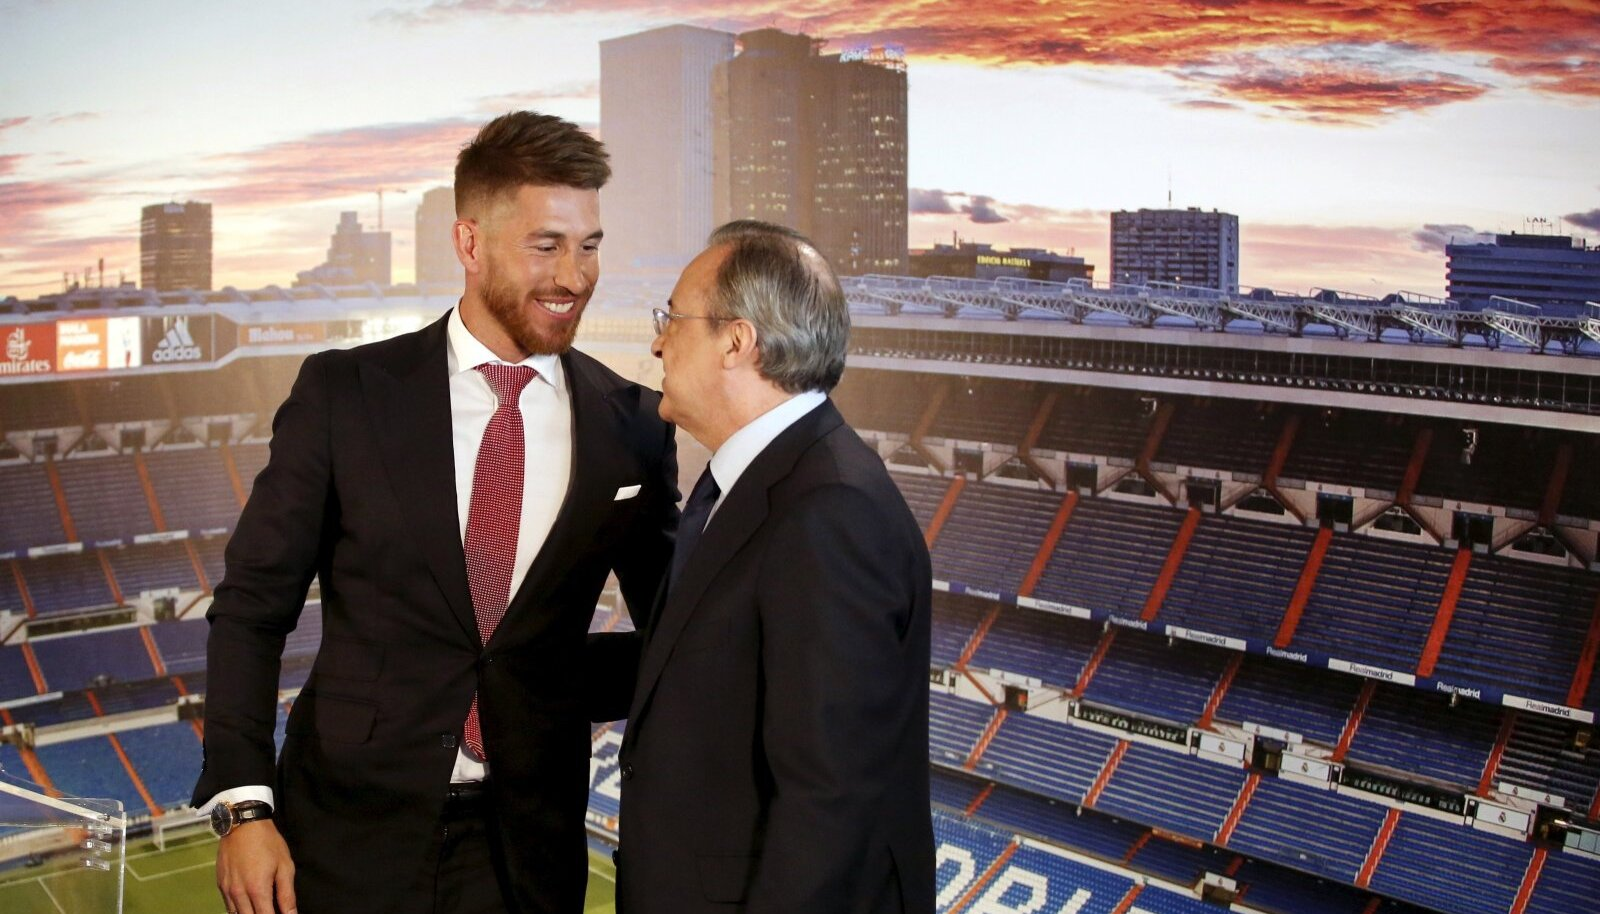 Real Madrid's Spain defender Sergio Ramos embraces Real Madrid president Florentino Perez at Santiago Bernabeu stadium in Madrid